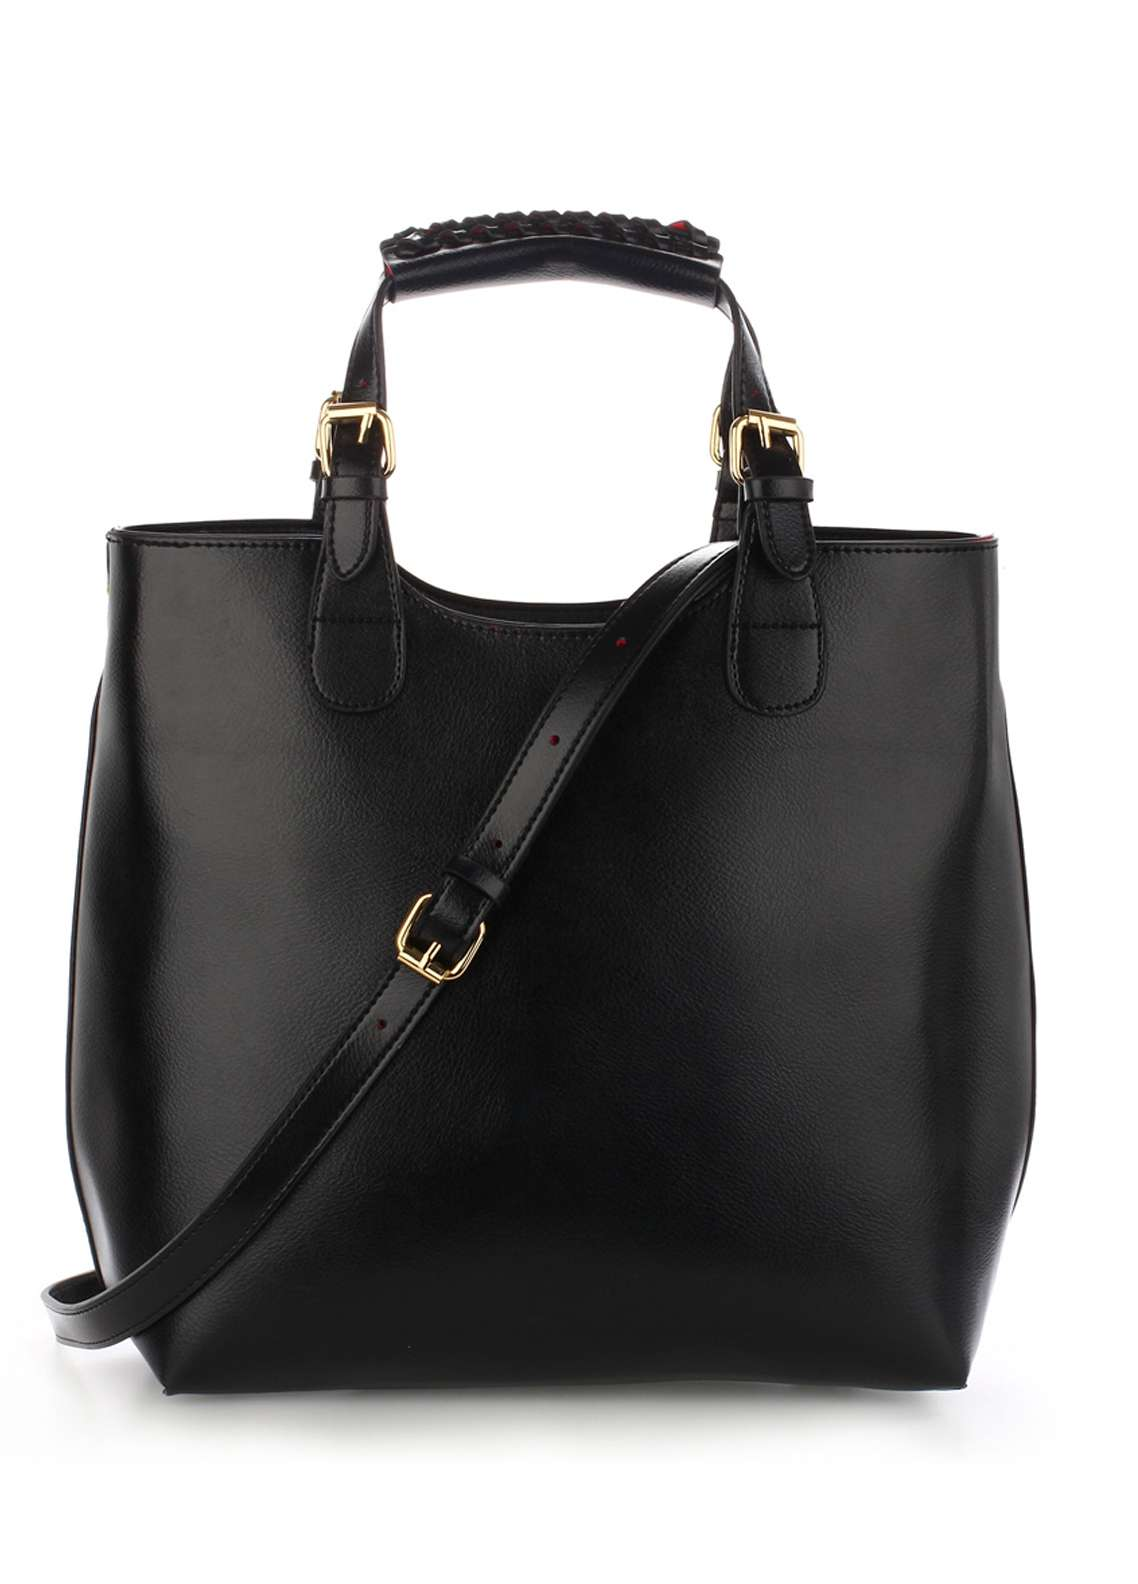 Anna Grace London Hard Faux Leather Shoulder  Bags  for Women  Black with Plain Texture